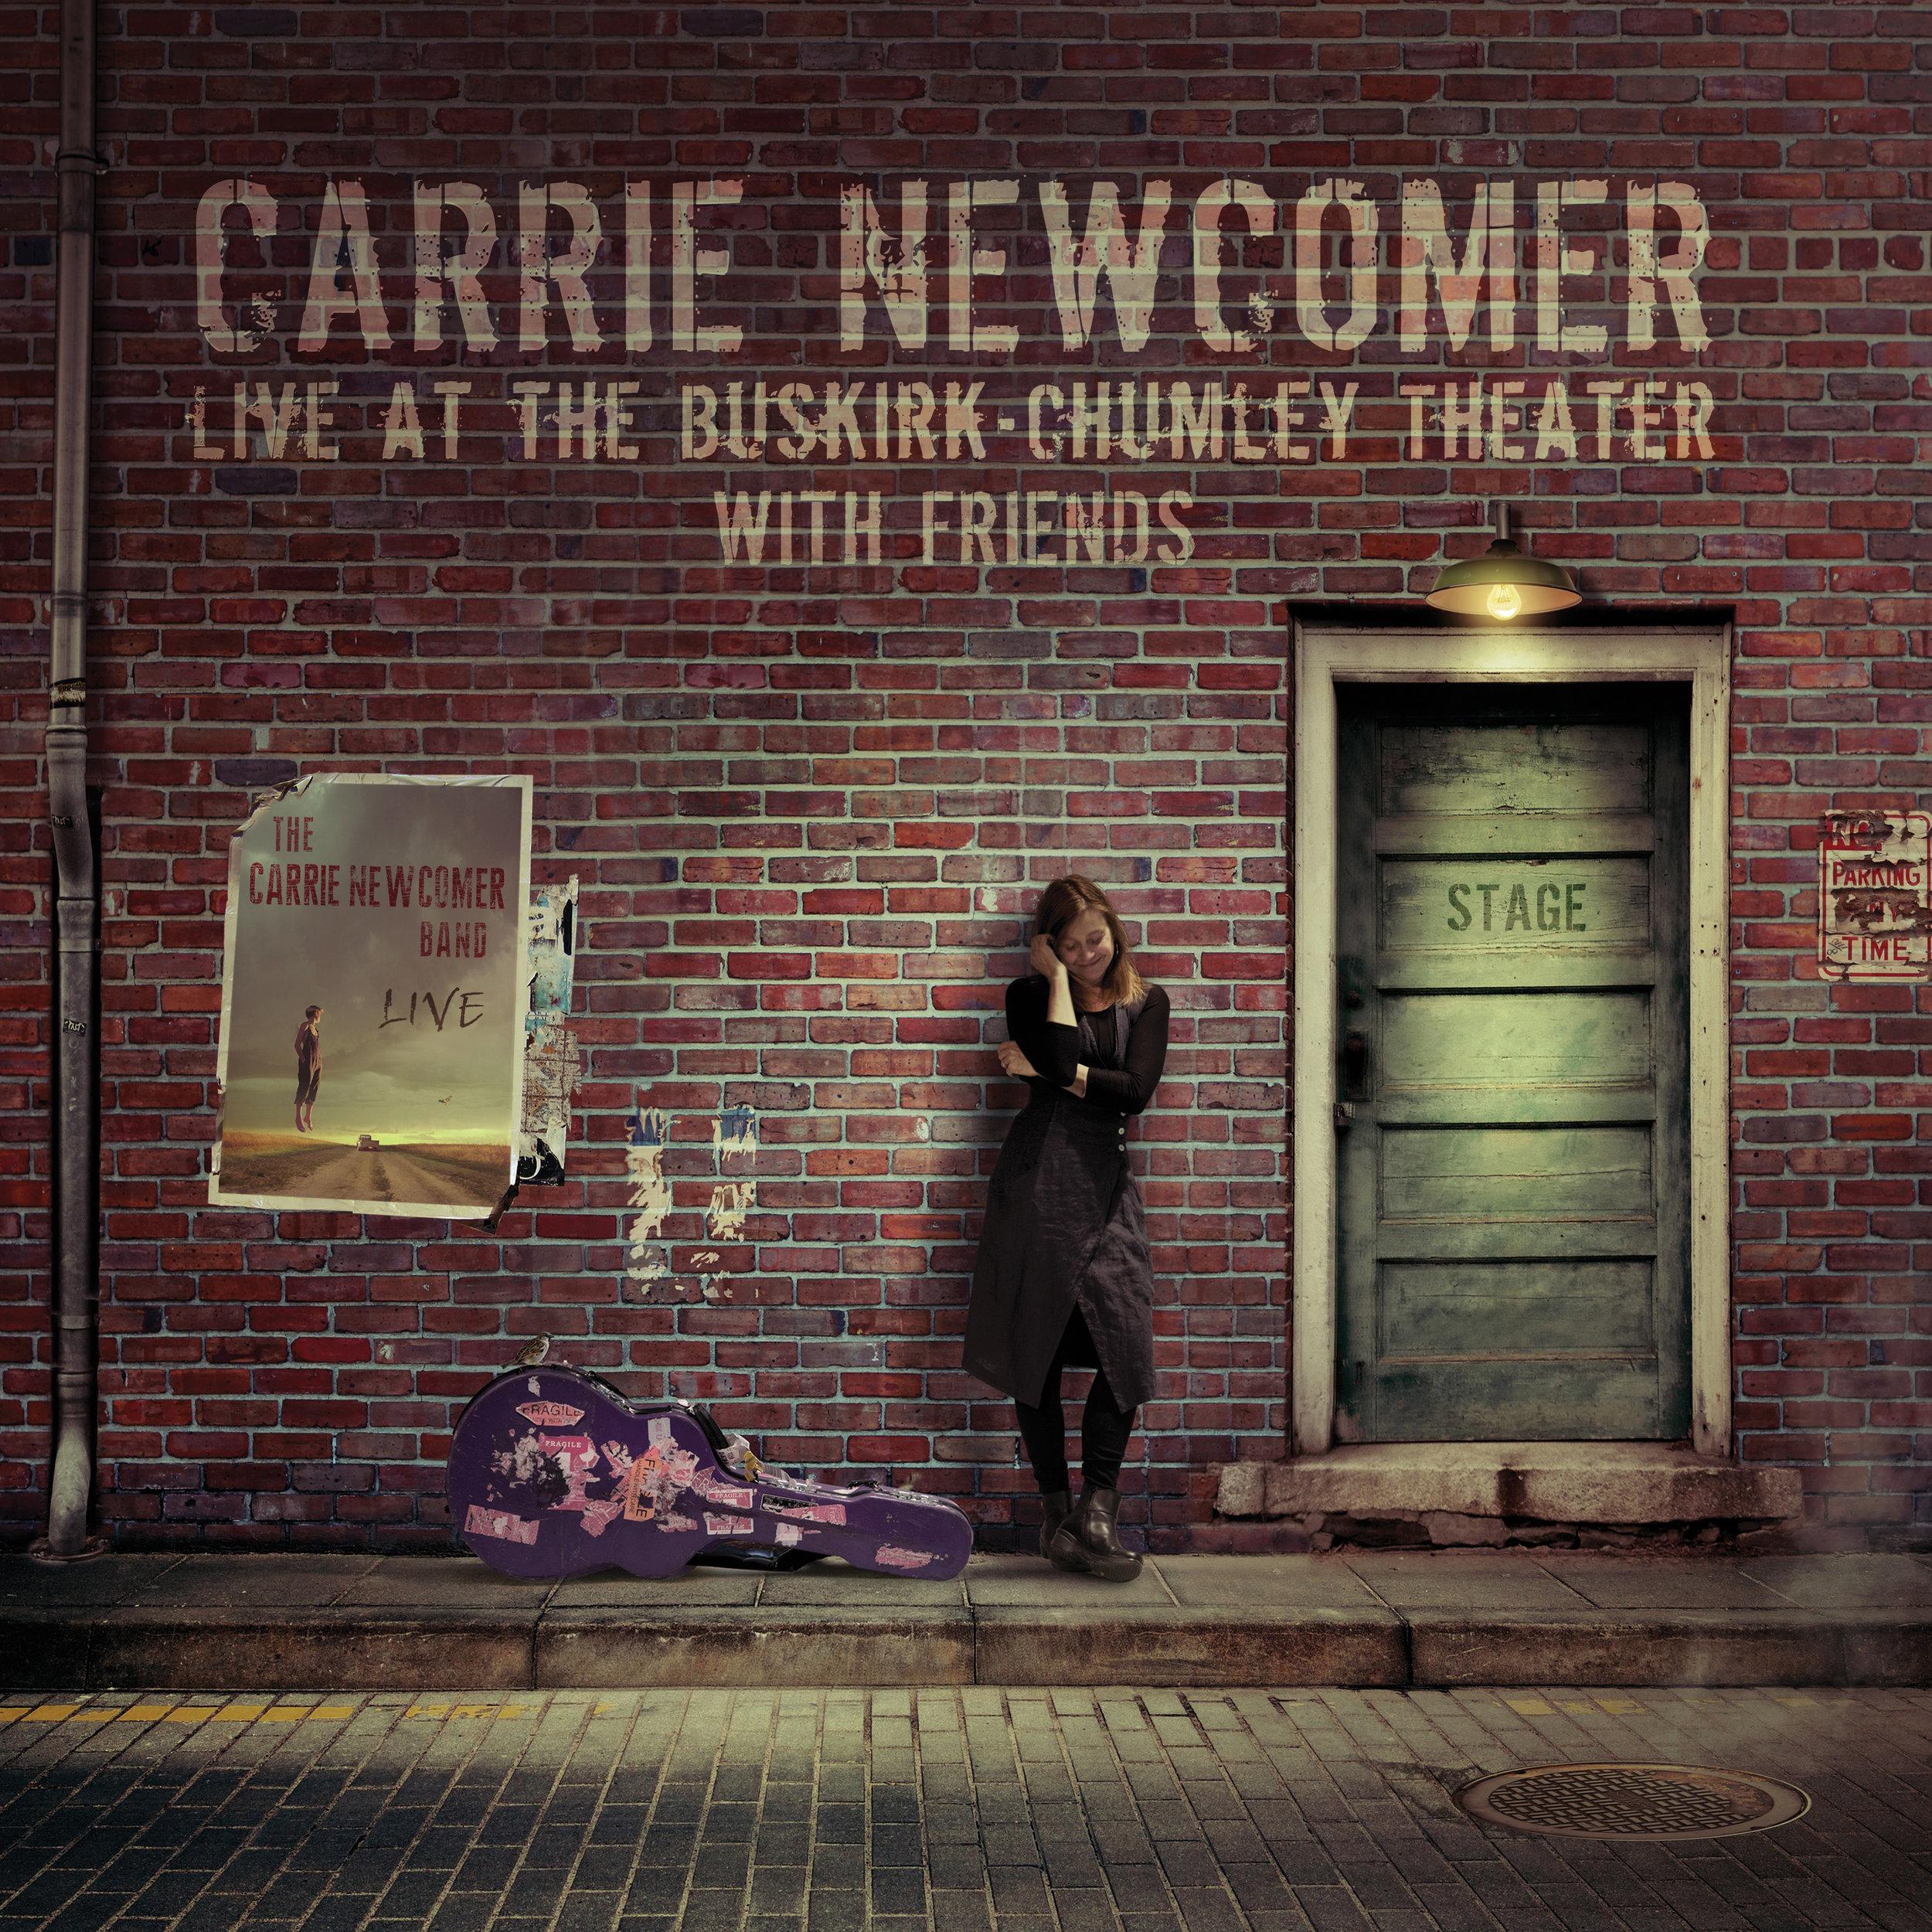 CarrieNewcomer_LiveBuskirk_HiRes copy.jpg